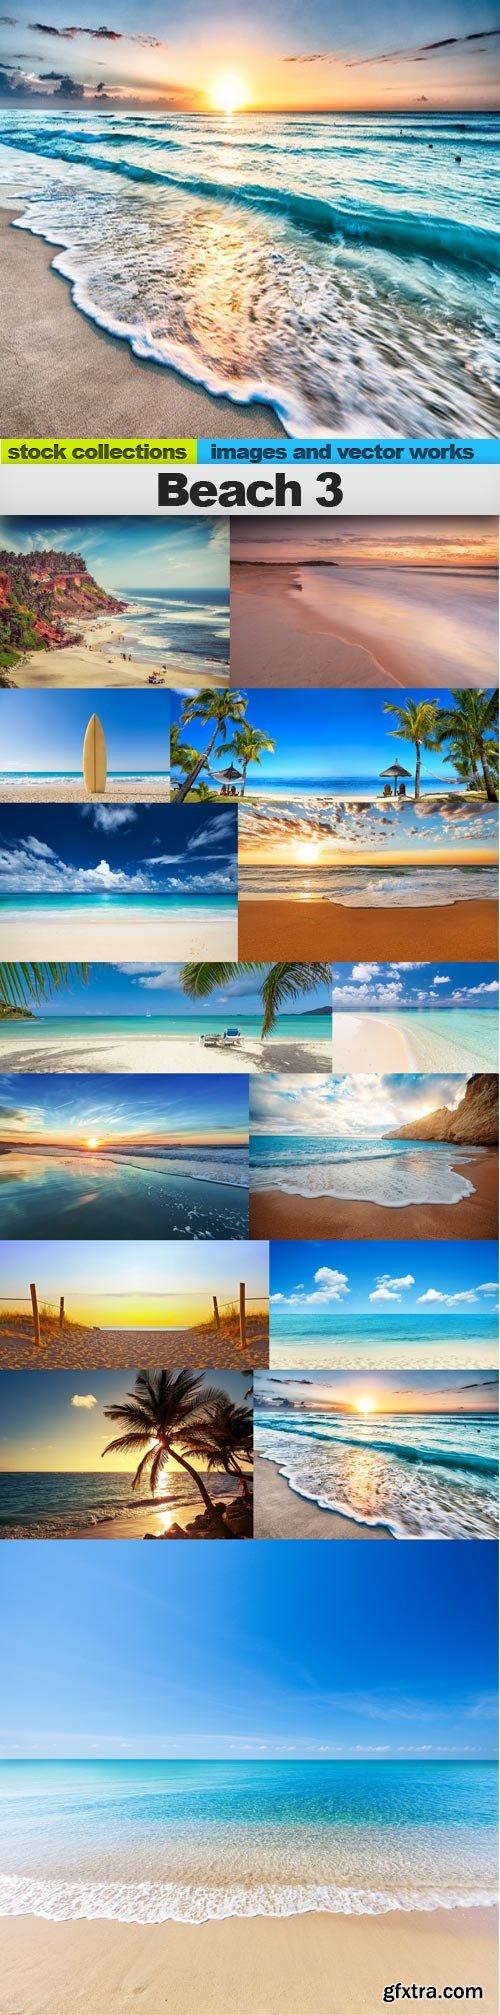 Beach 3, 15 x UHQ JPEG